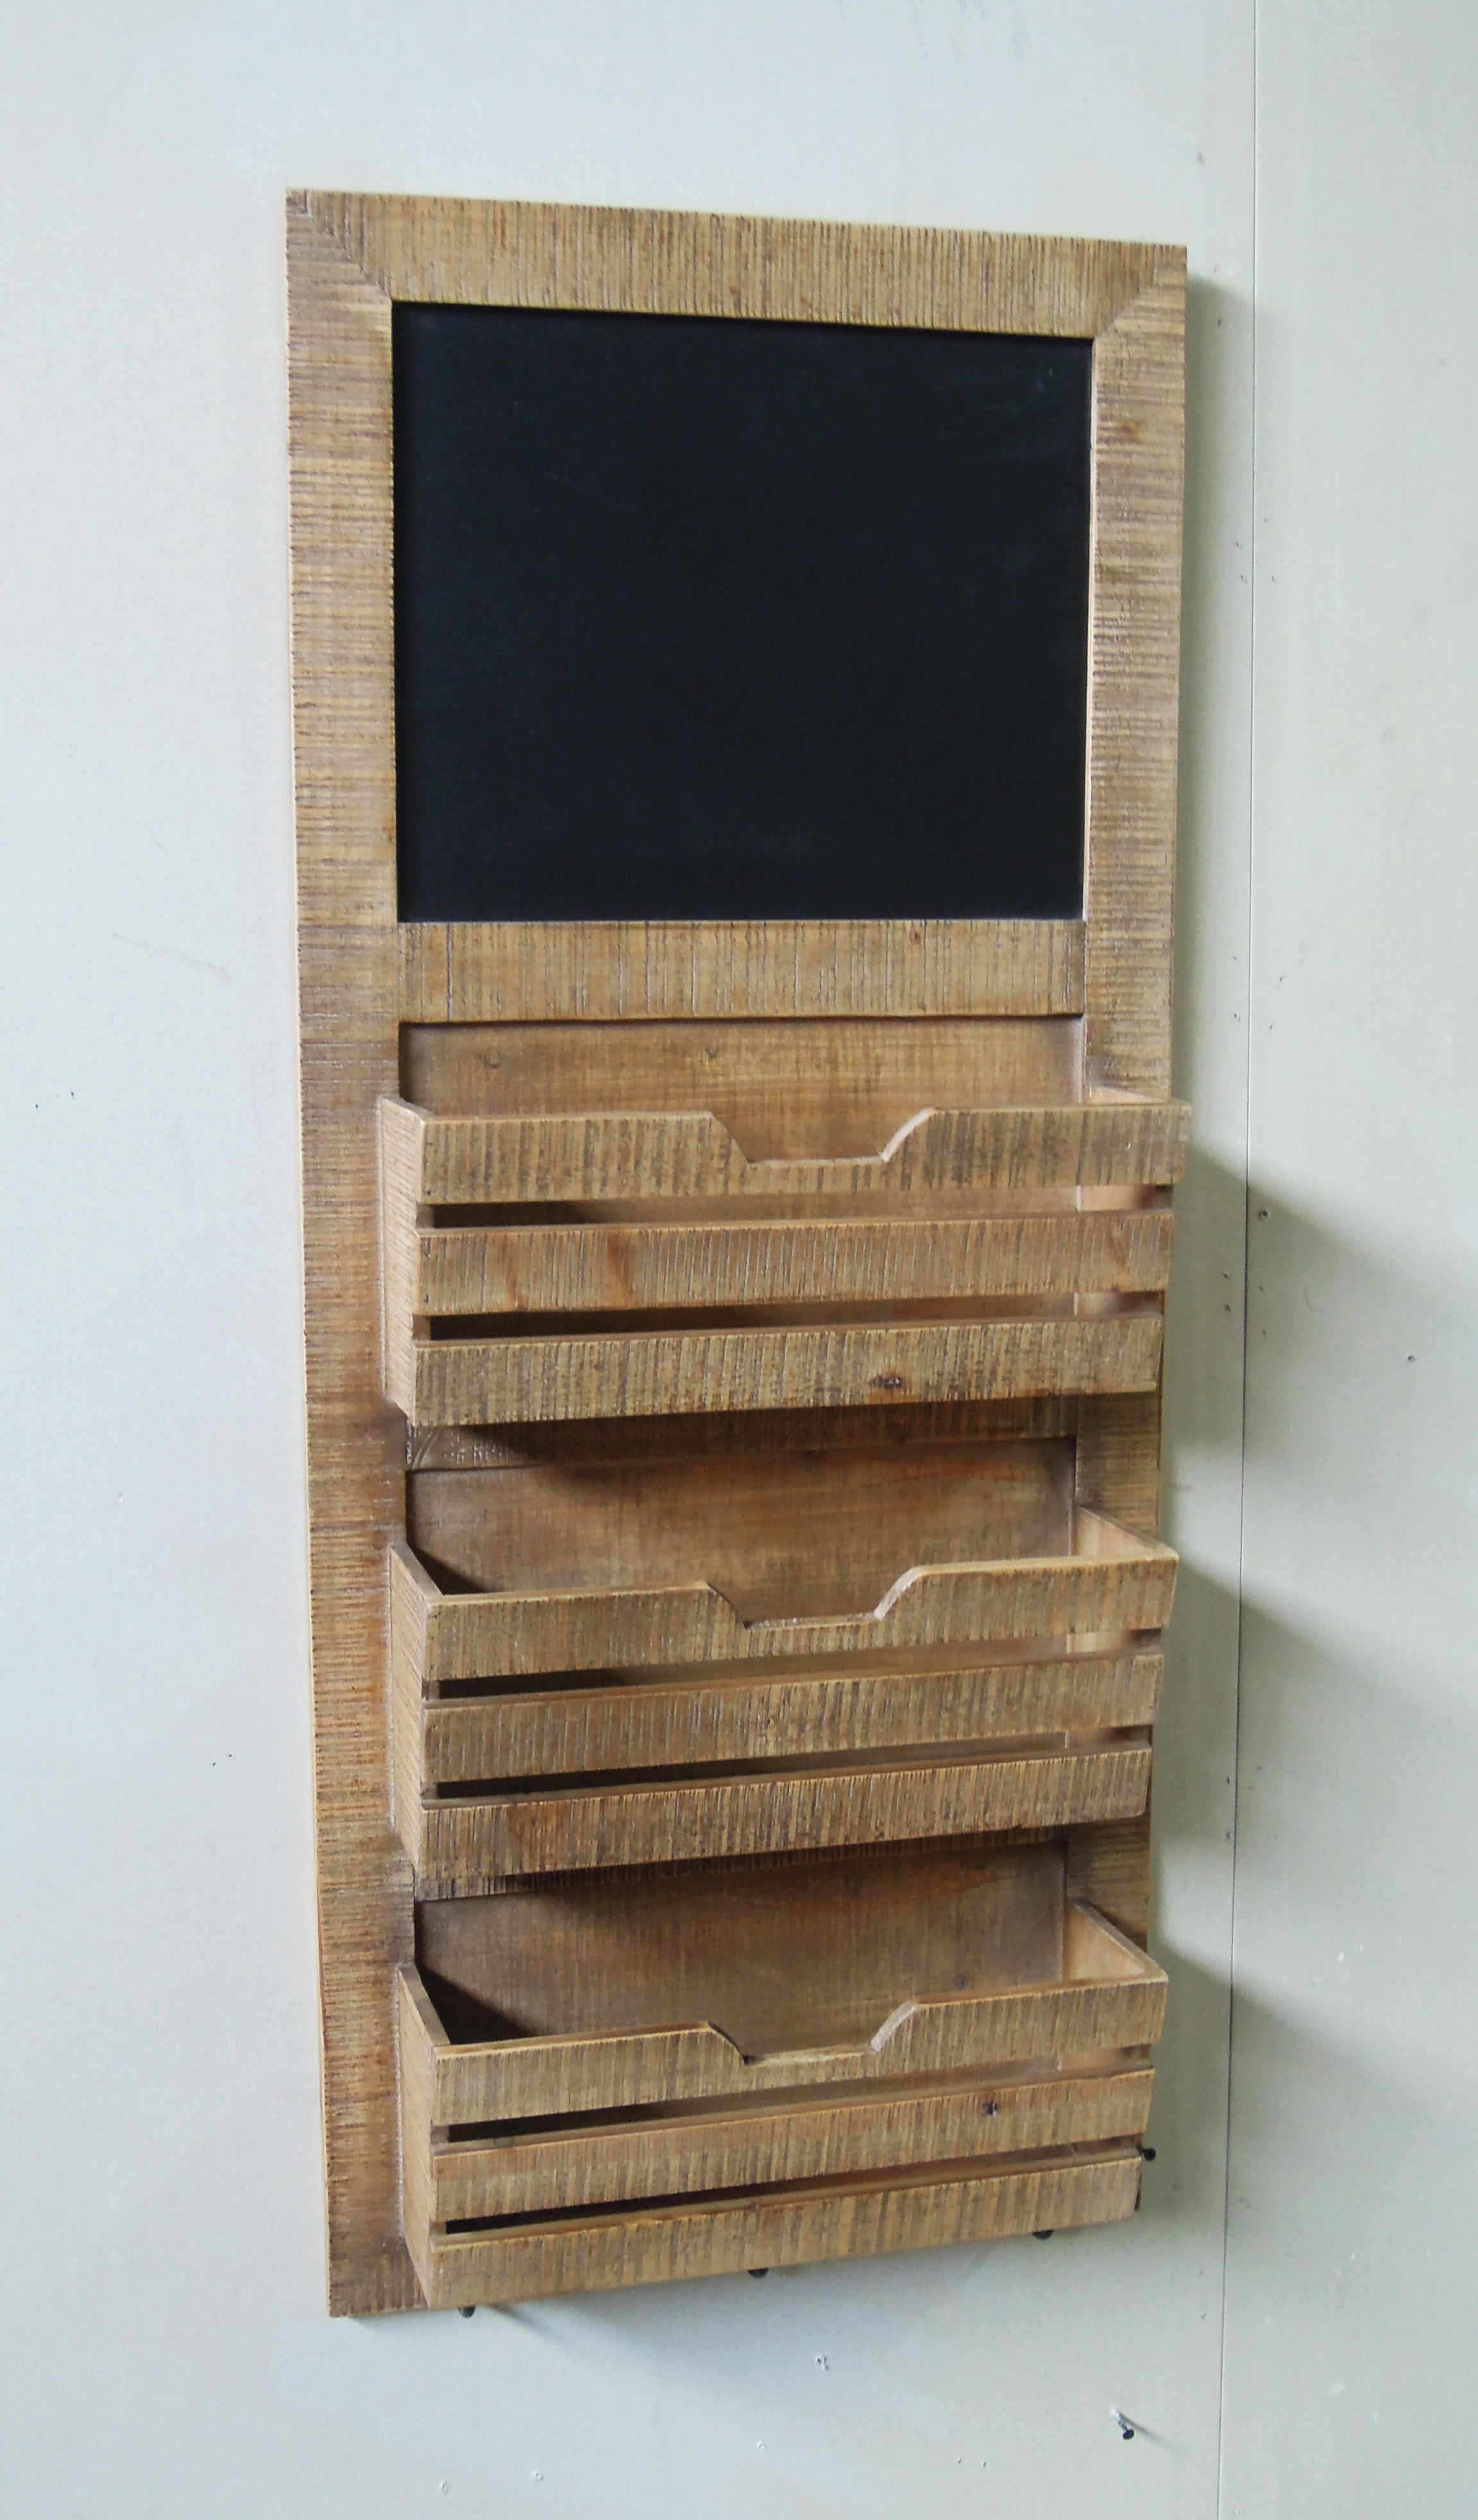 Finest Vintage 3-tier wooden wall shelf with chalkboard,Cabinet BX43